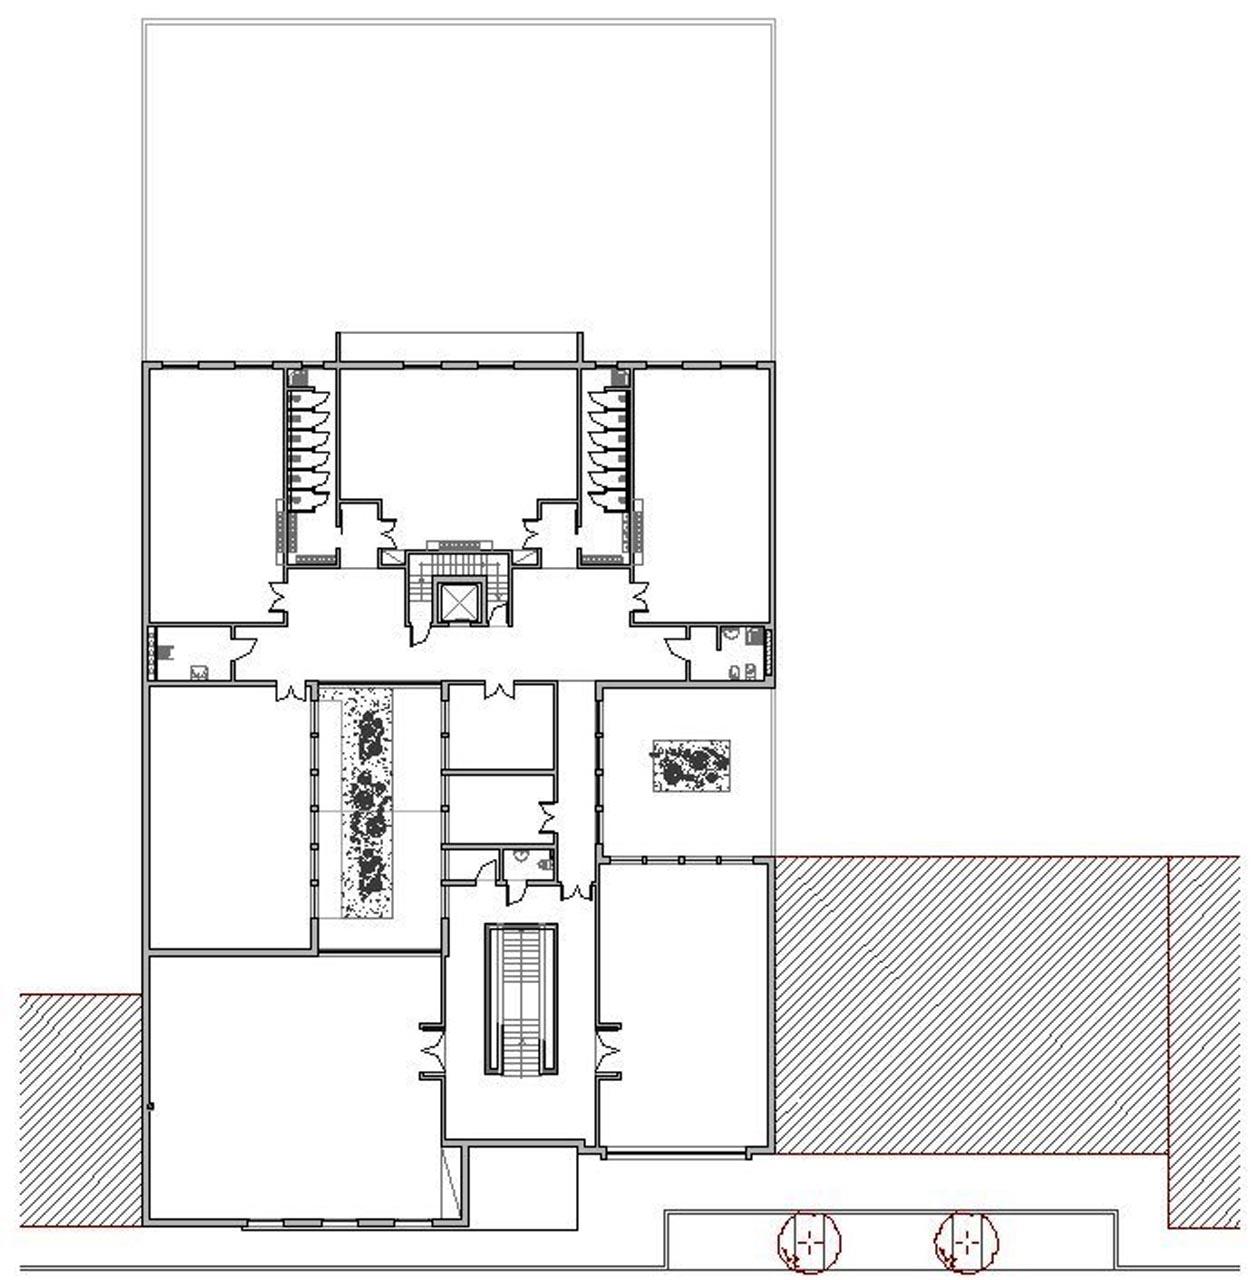 https://www.araujo-arquitectura.pt/wp-content/uploads/2020/12/Piso_1.jpg